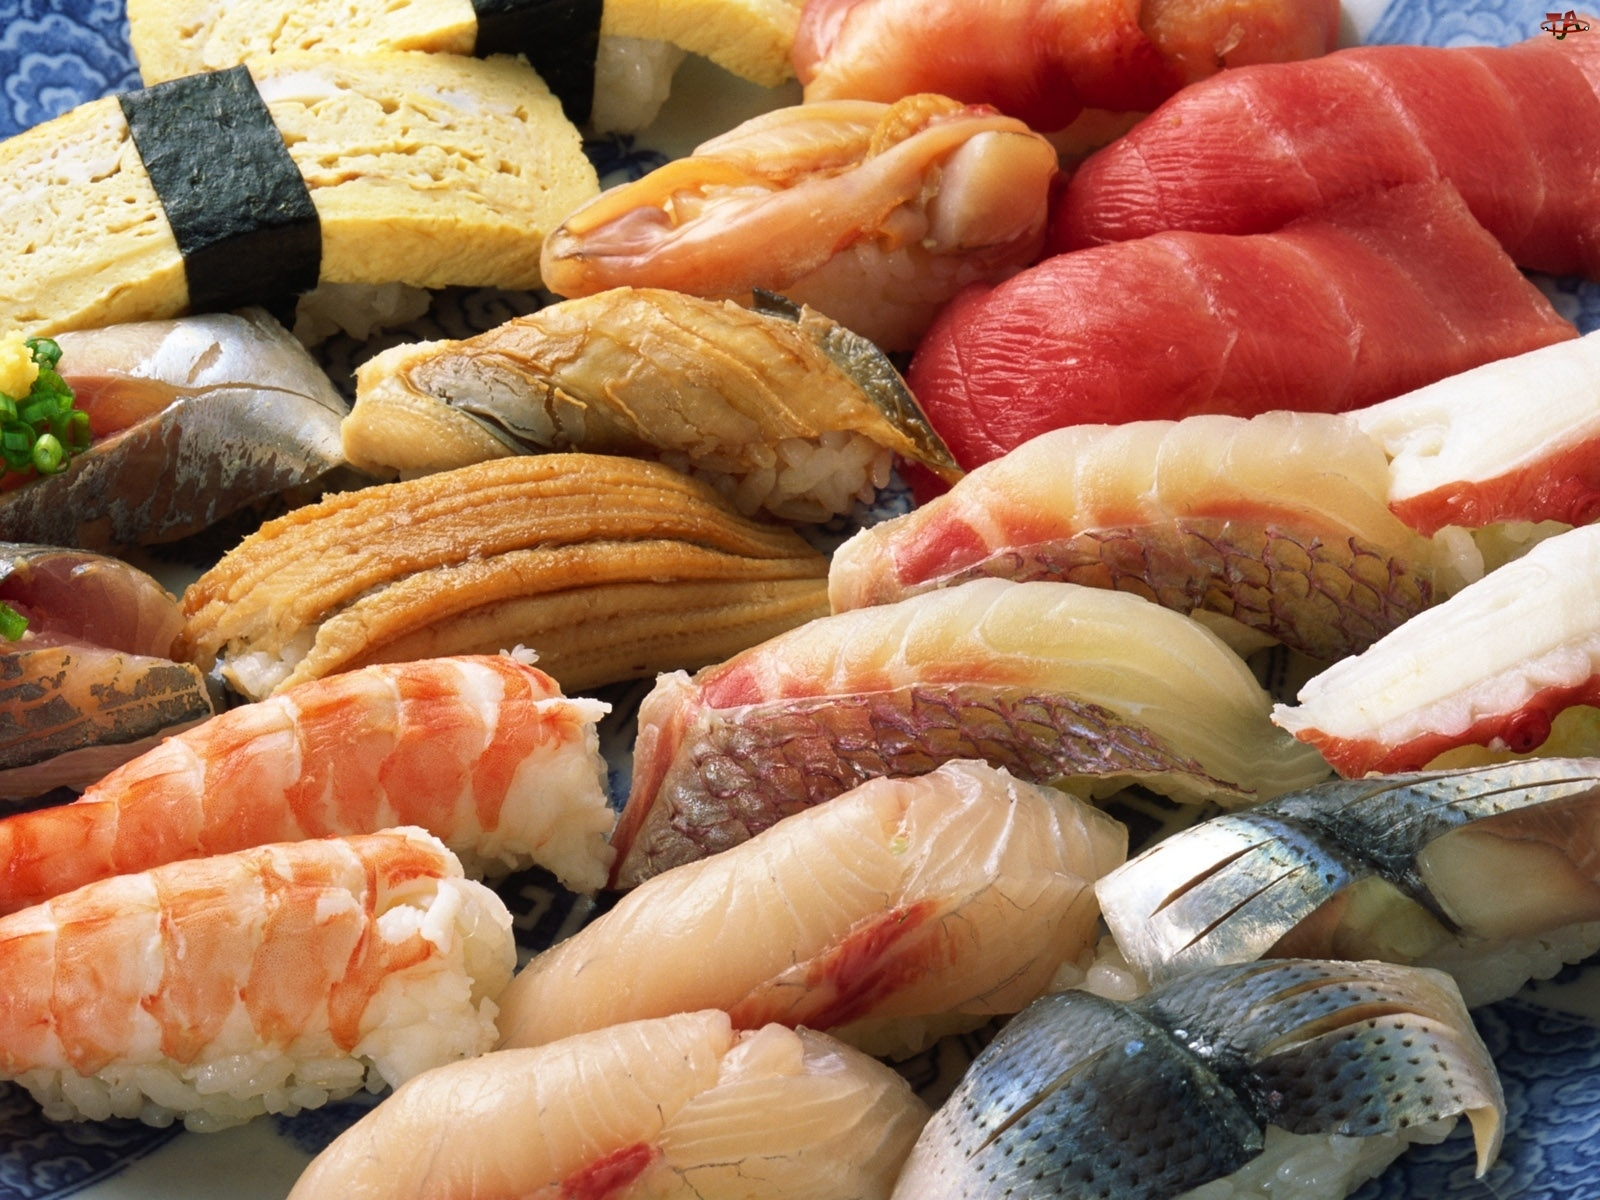 Morza, Kolorowe, Owoce